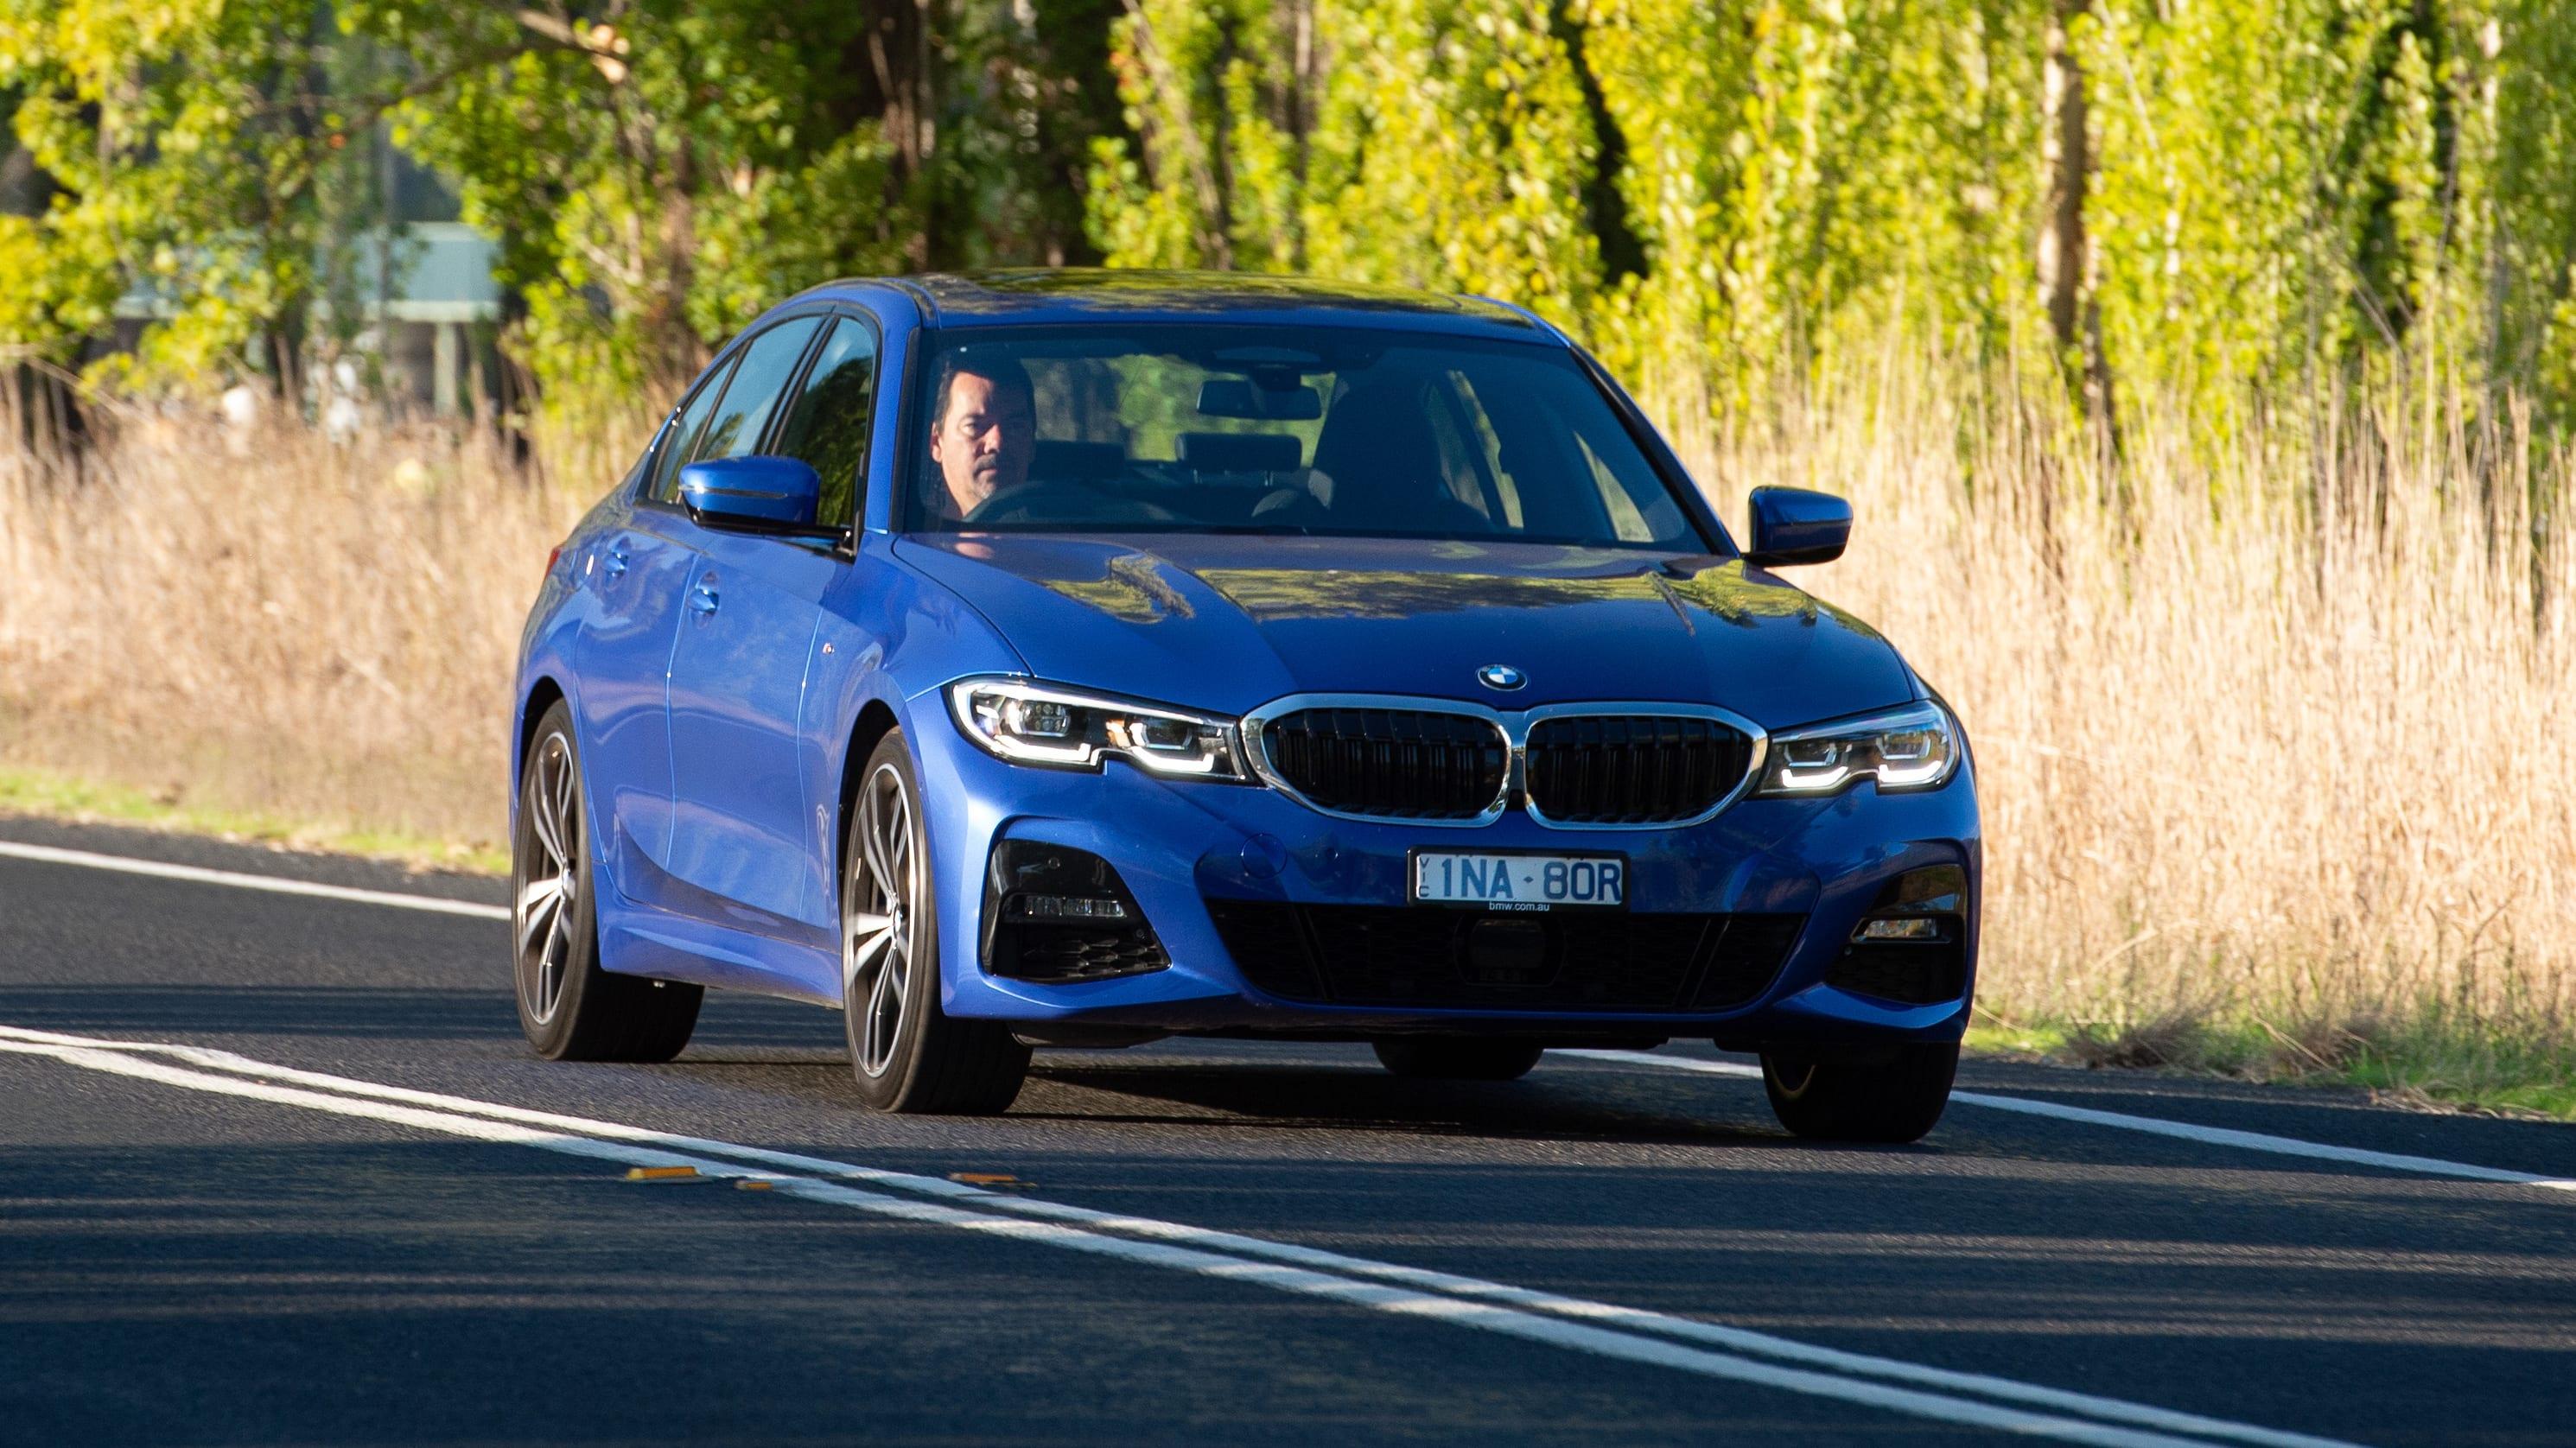 2019 BMW 330i v Audi A4 45 v Mercedes-Benz C300 comparison | CarAdvice